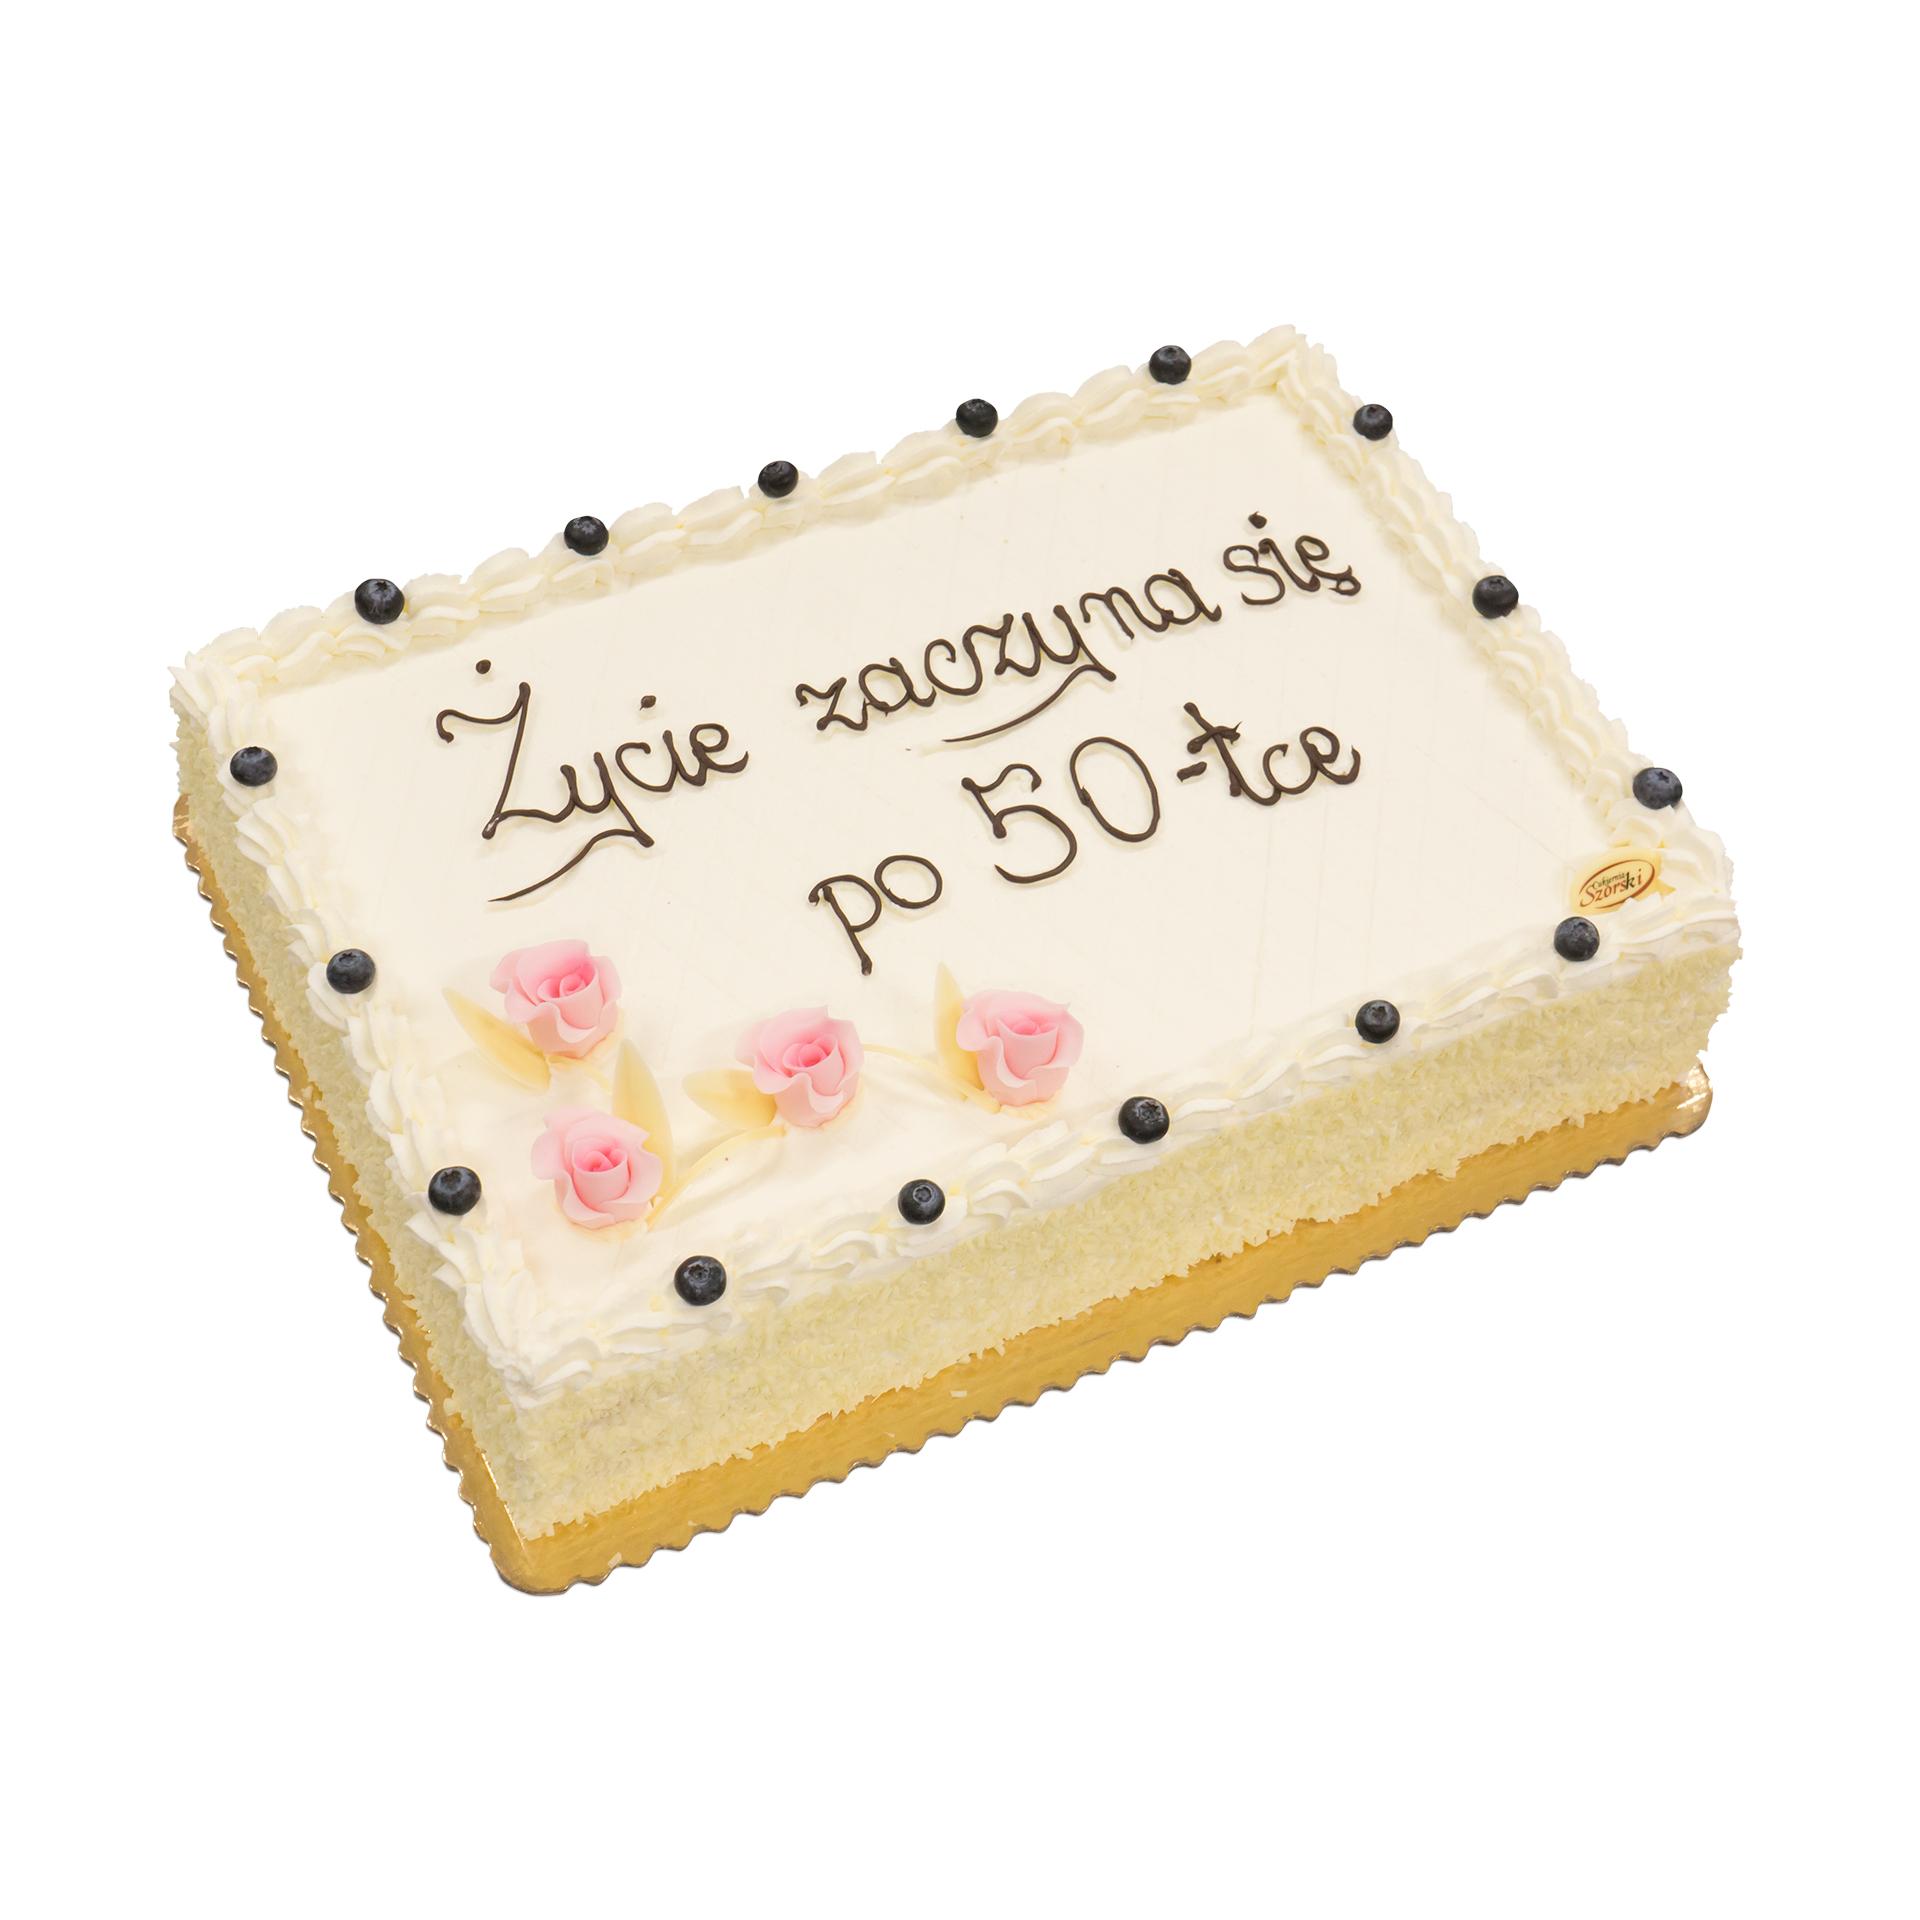 tort na 50-lecie